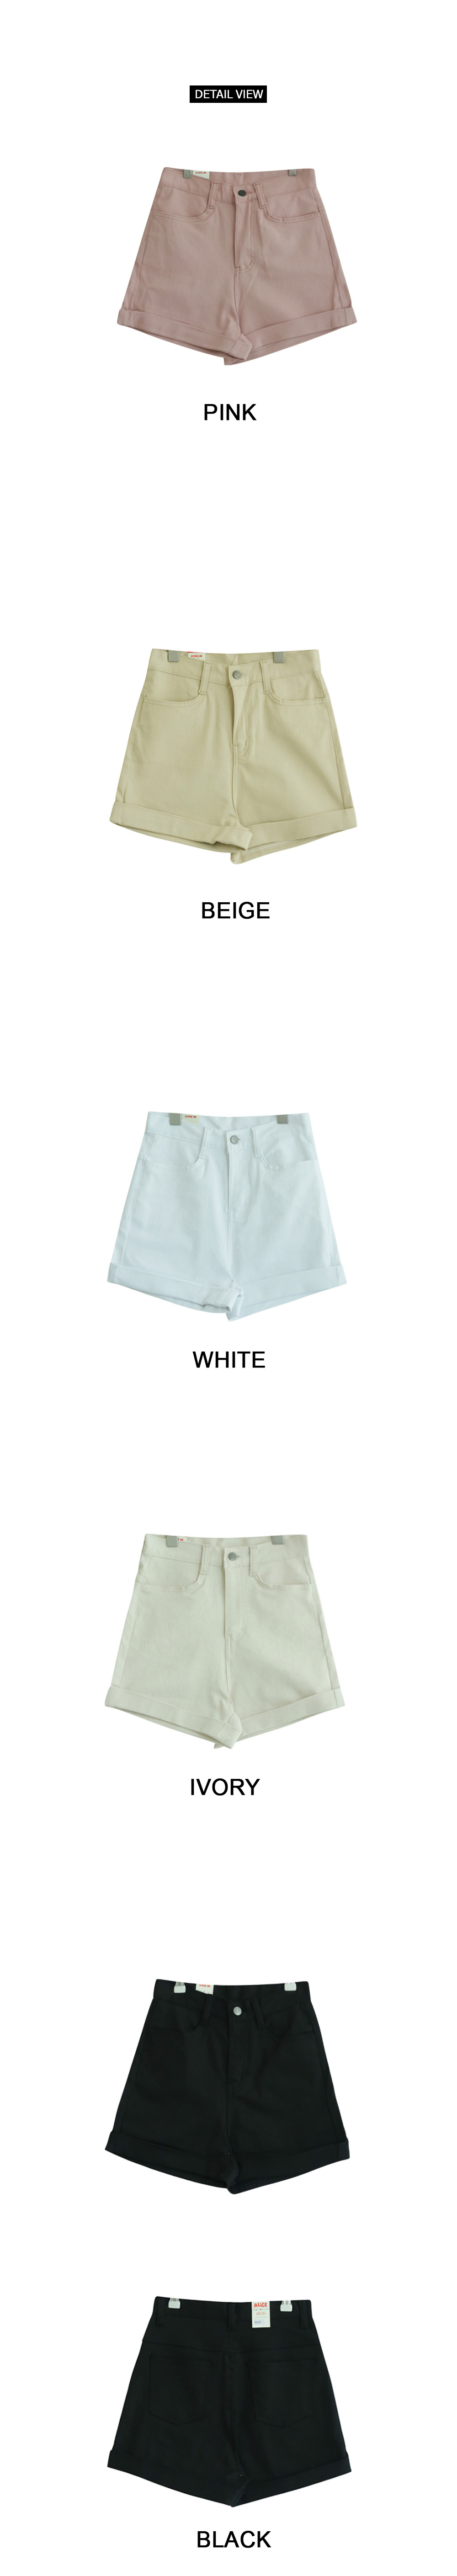 Cotton high three-ply denim shorts